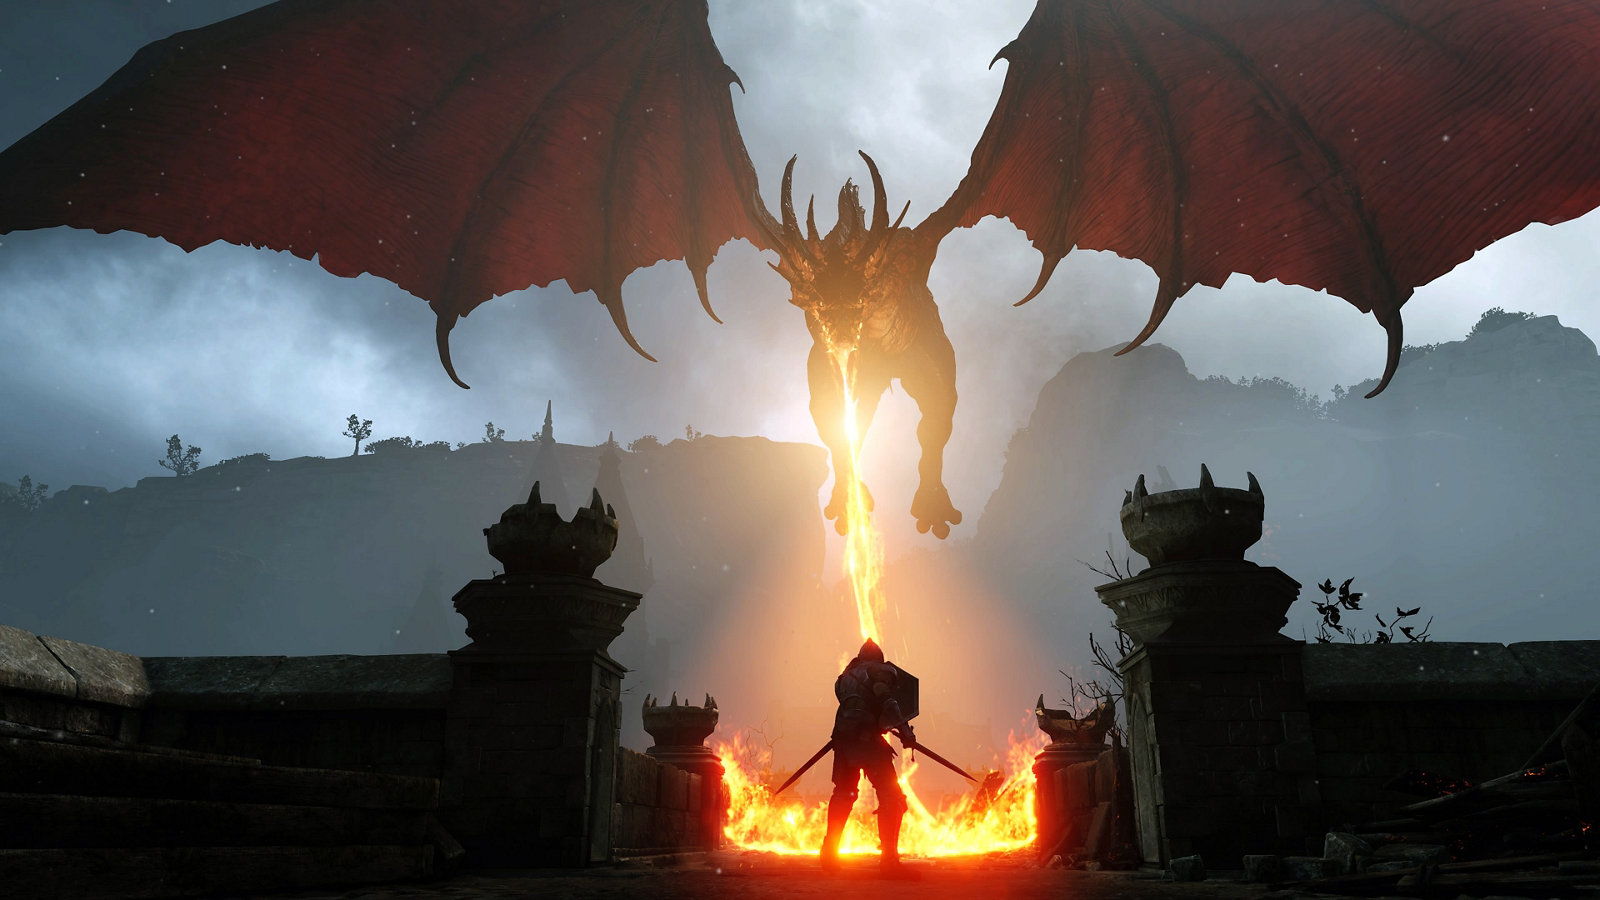 Demon's Souls Digital Deluxe Edition and digital pre-order bonus announced thumbnail